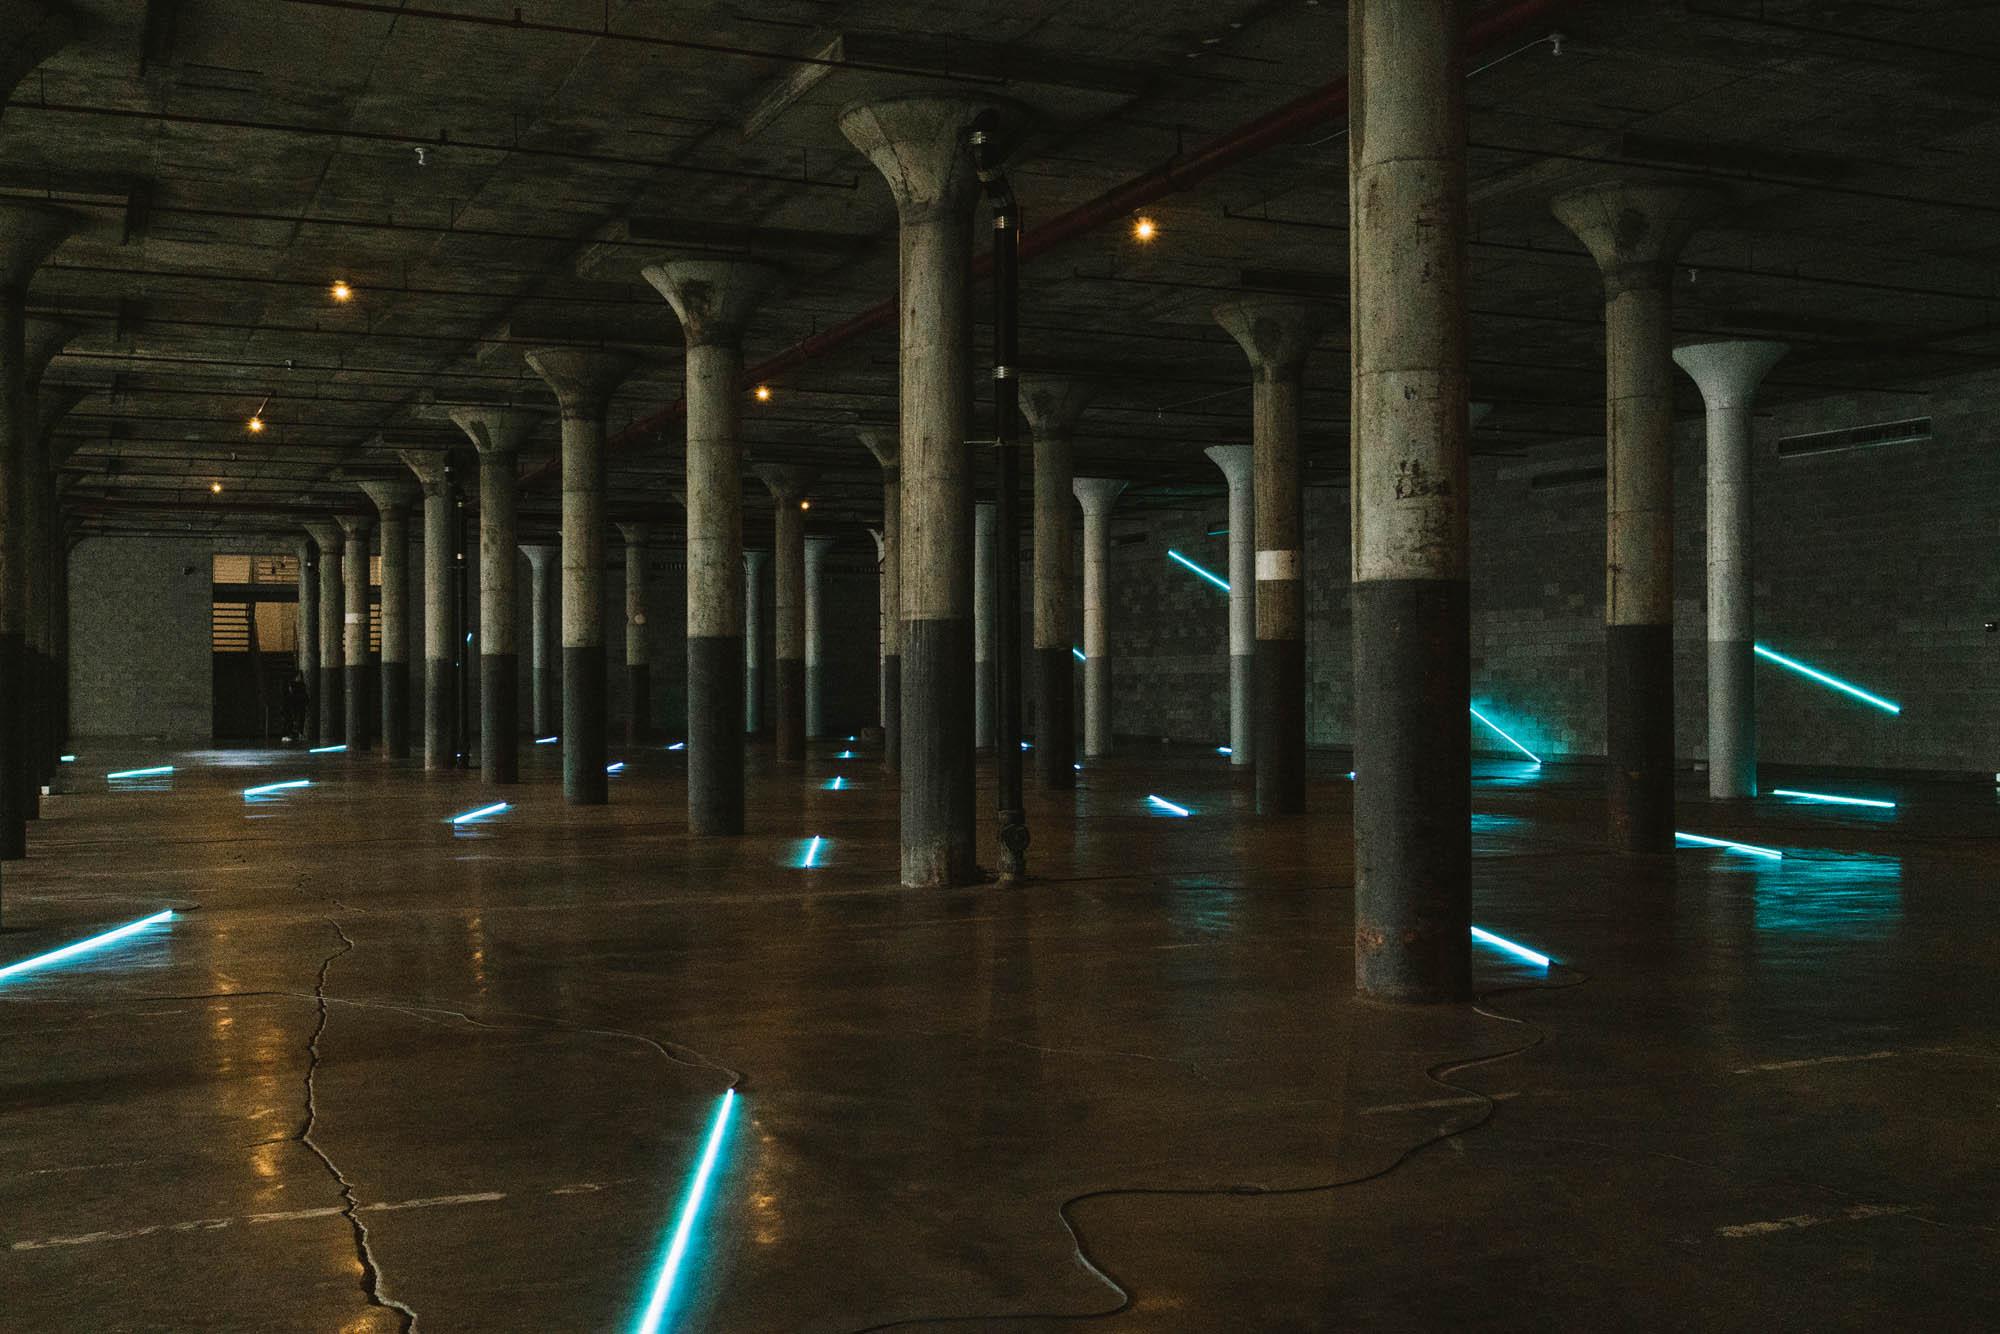 François Morellet: No End Neon